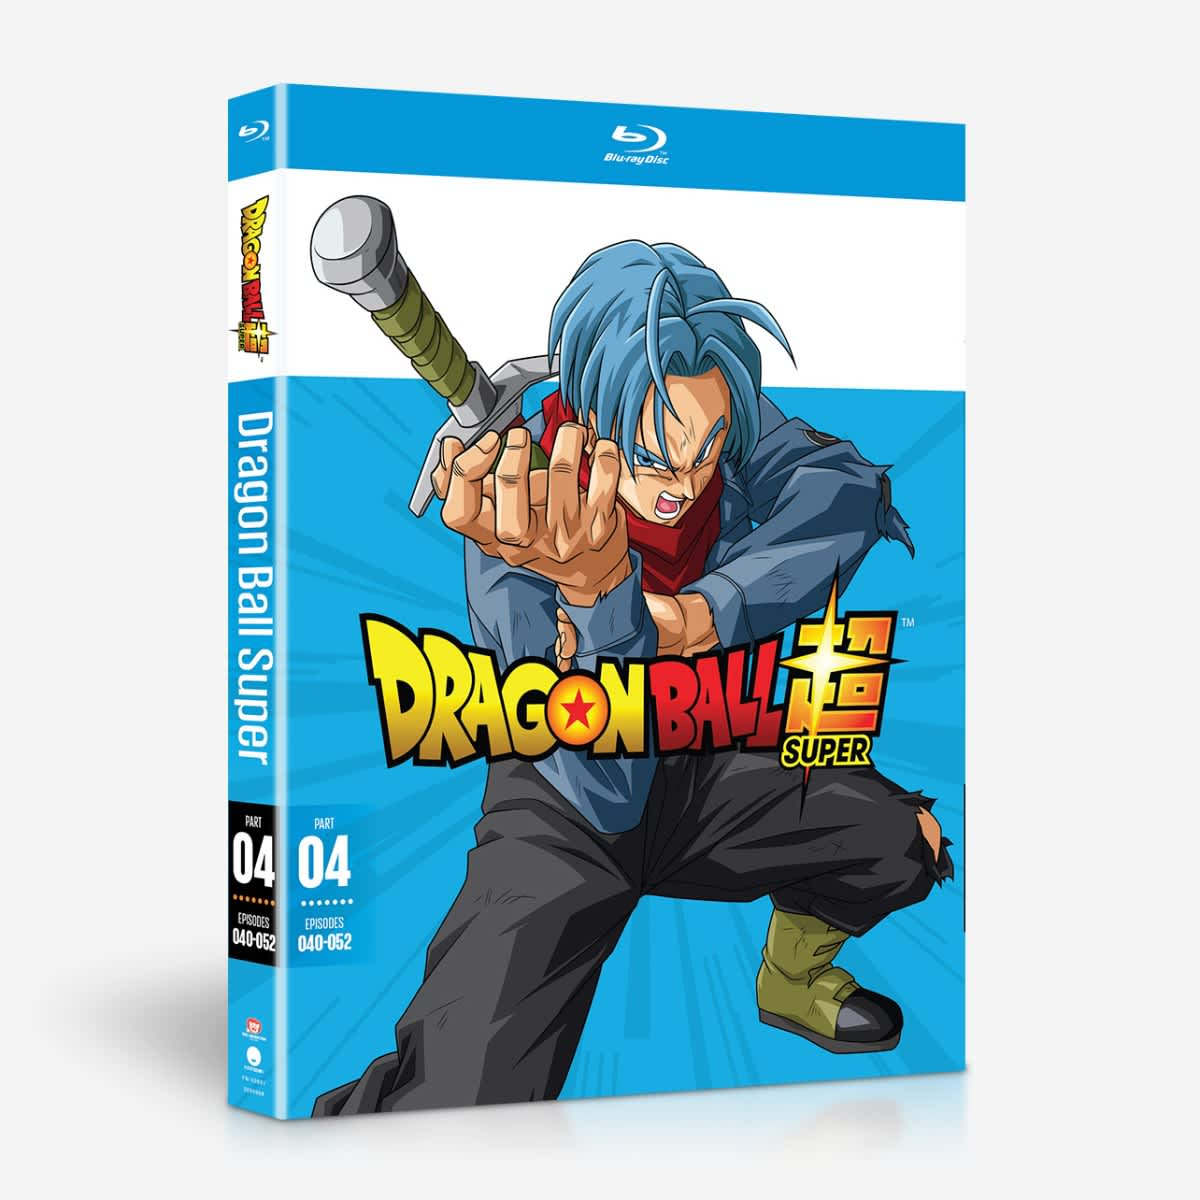 Dragon Ball Super Part 4 Blu-ray 704400038013